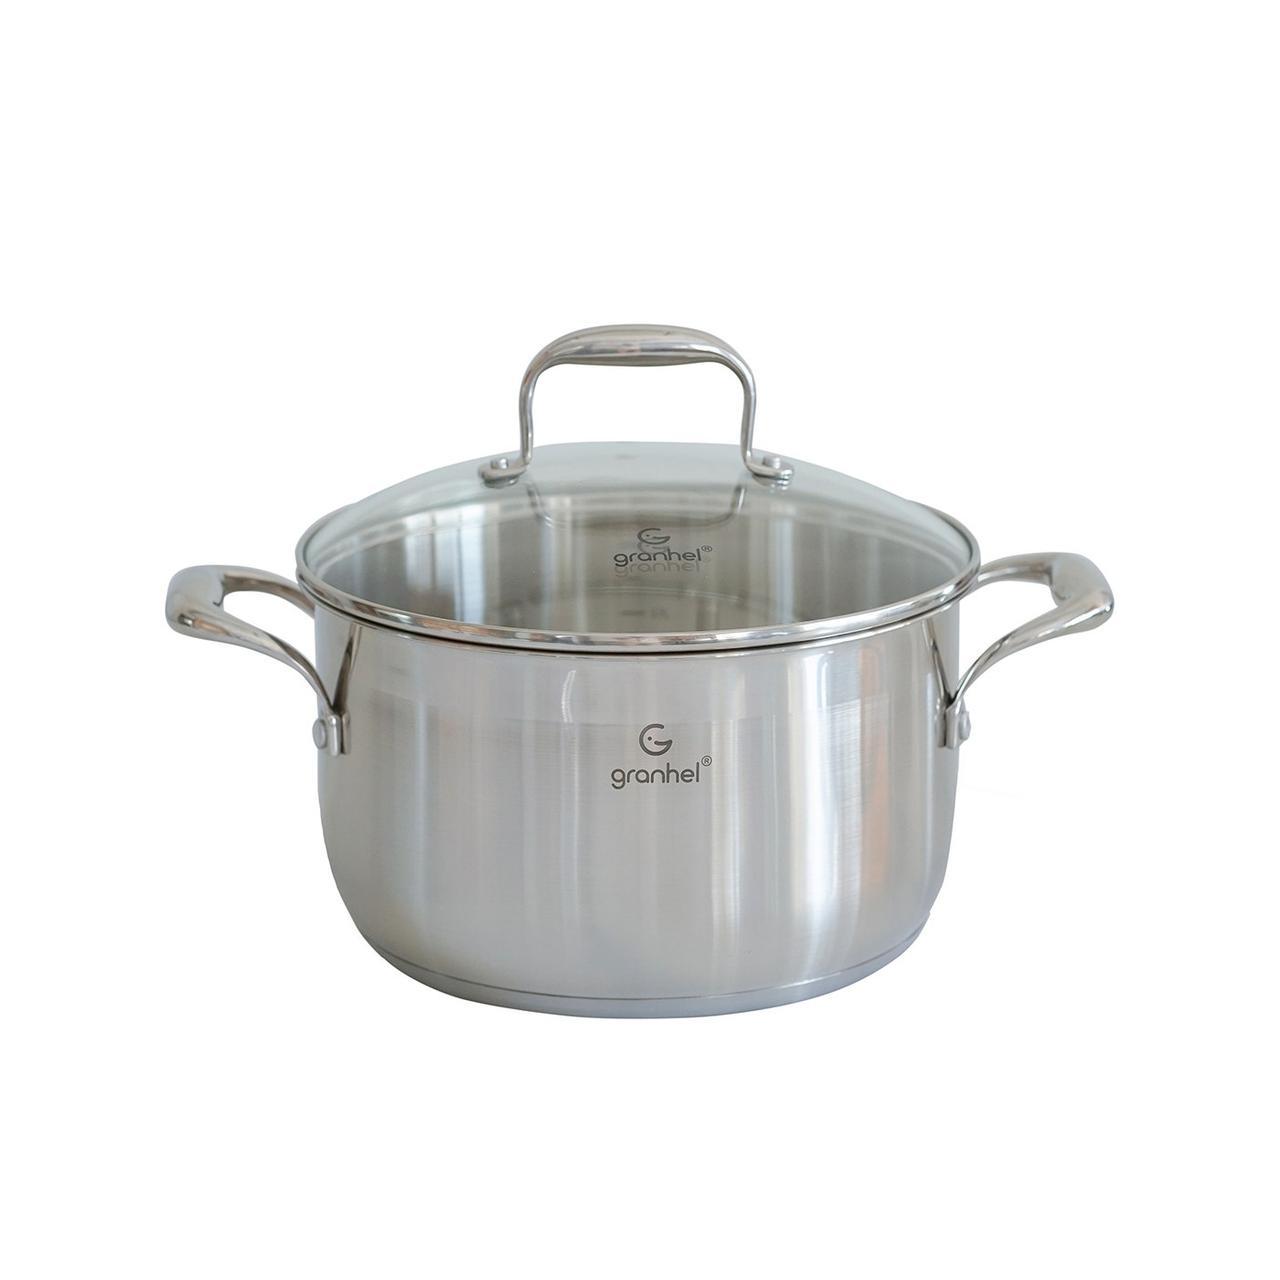 Кастрюля granhel Stainless steel 18/10 24х13,5 см 6,0 л